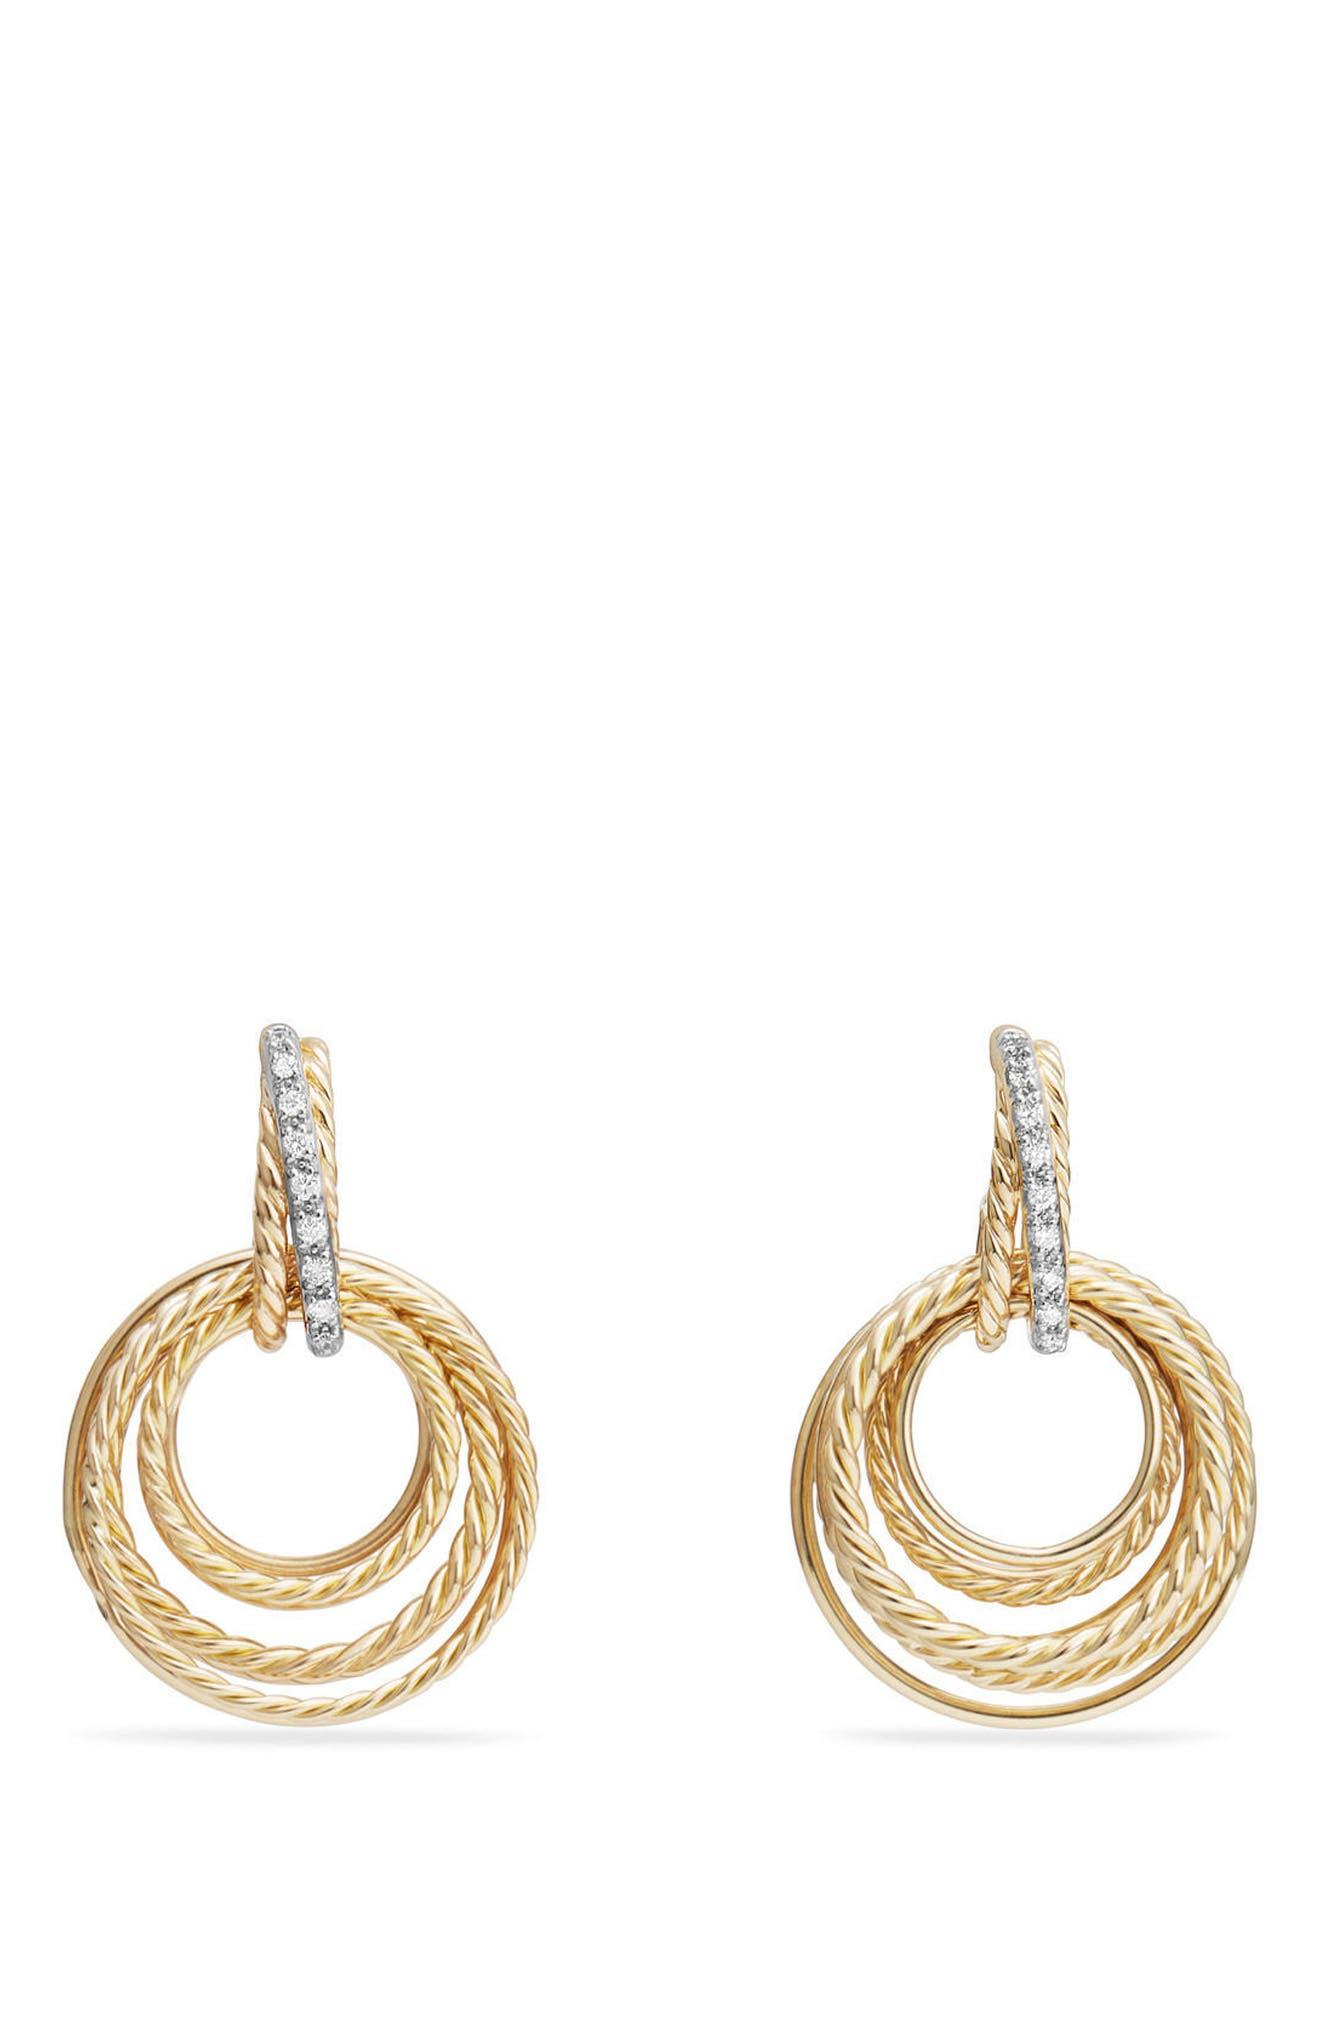 Crossover Diamond Drop Earrings,                             Main thumbnail 1, color,                             YELLOW GOLD/ DIAMOND